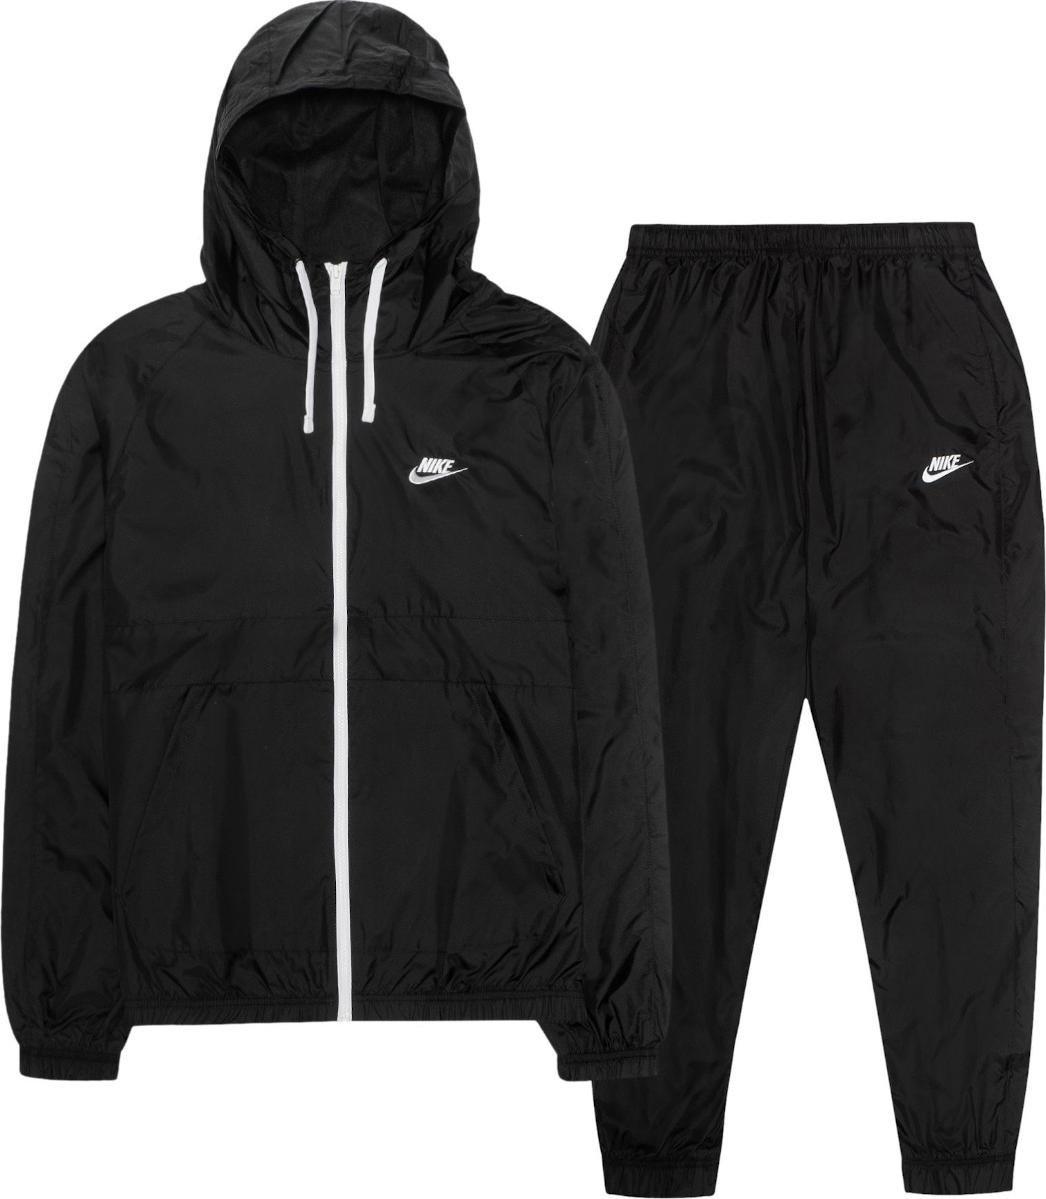 Reprimir Noble Pocos  Kit Nike M NSW CE TRK SUIT HD WVN - Top4Football.com